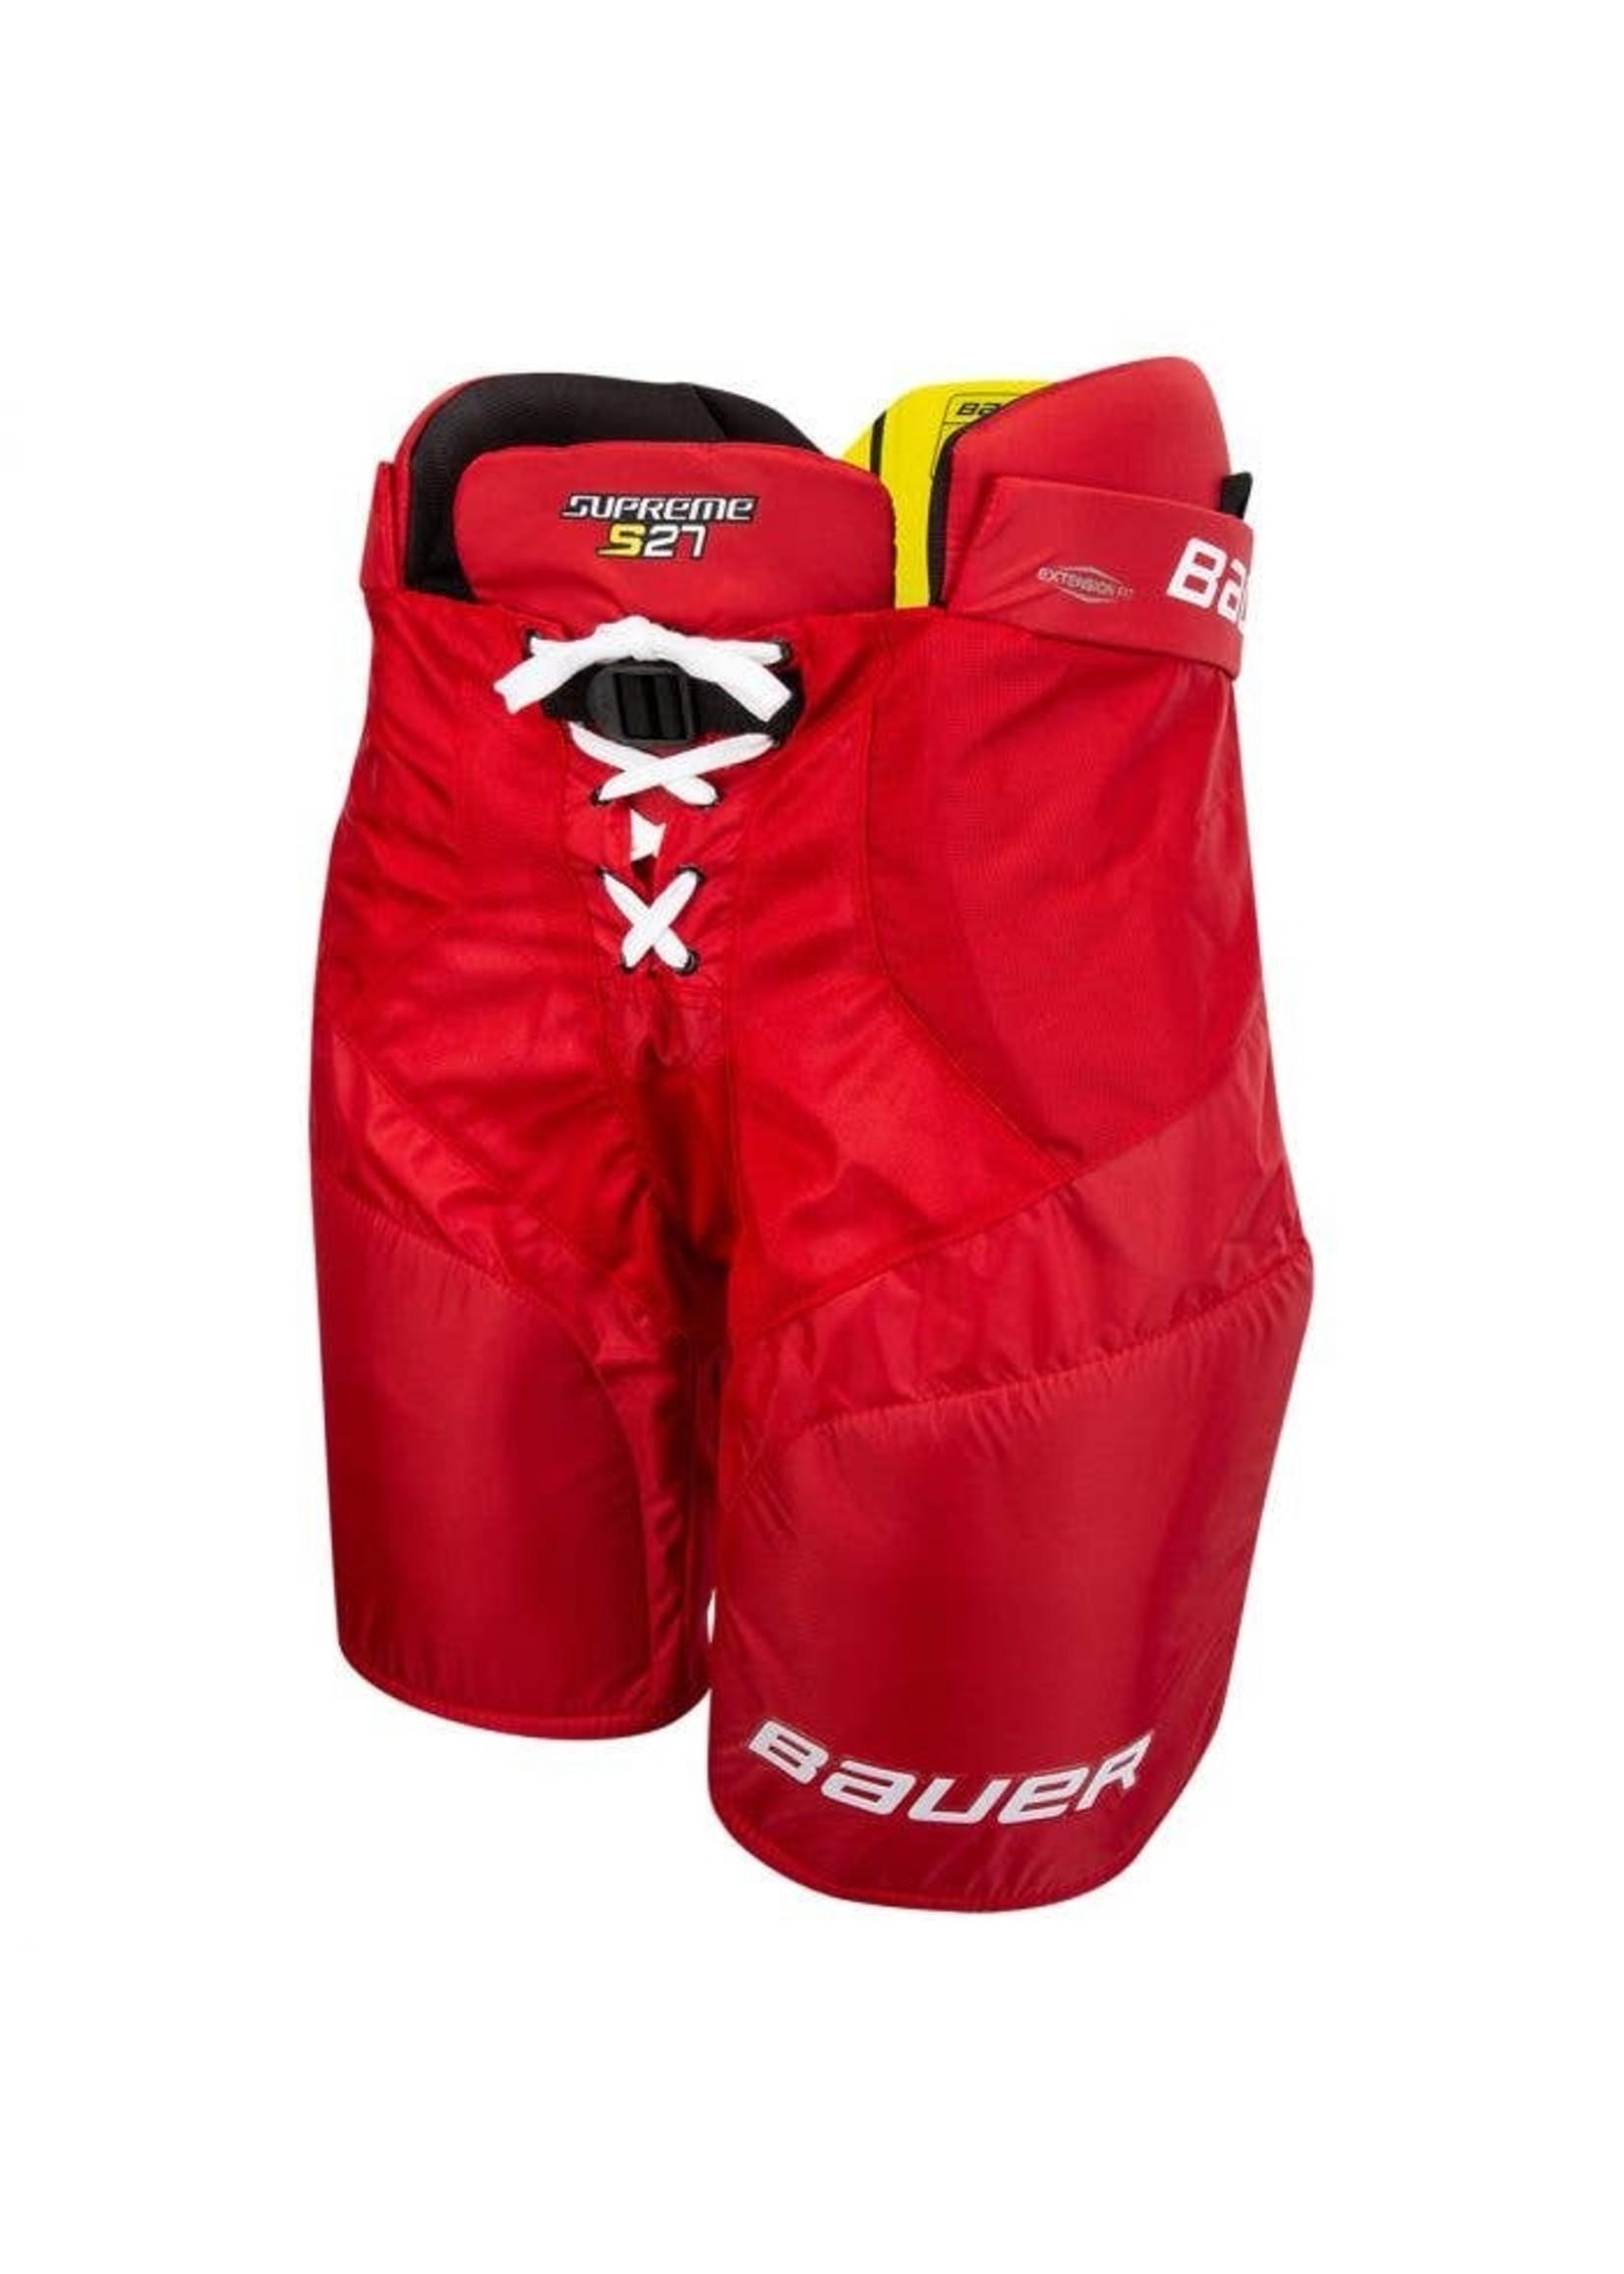 Bauer Hockey BAUER S19 SUPREME S27 JR PANTALONS